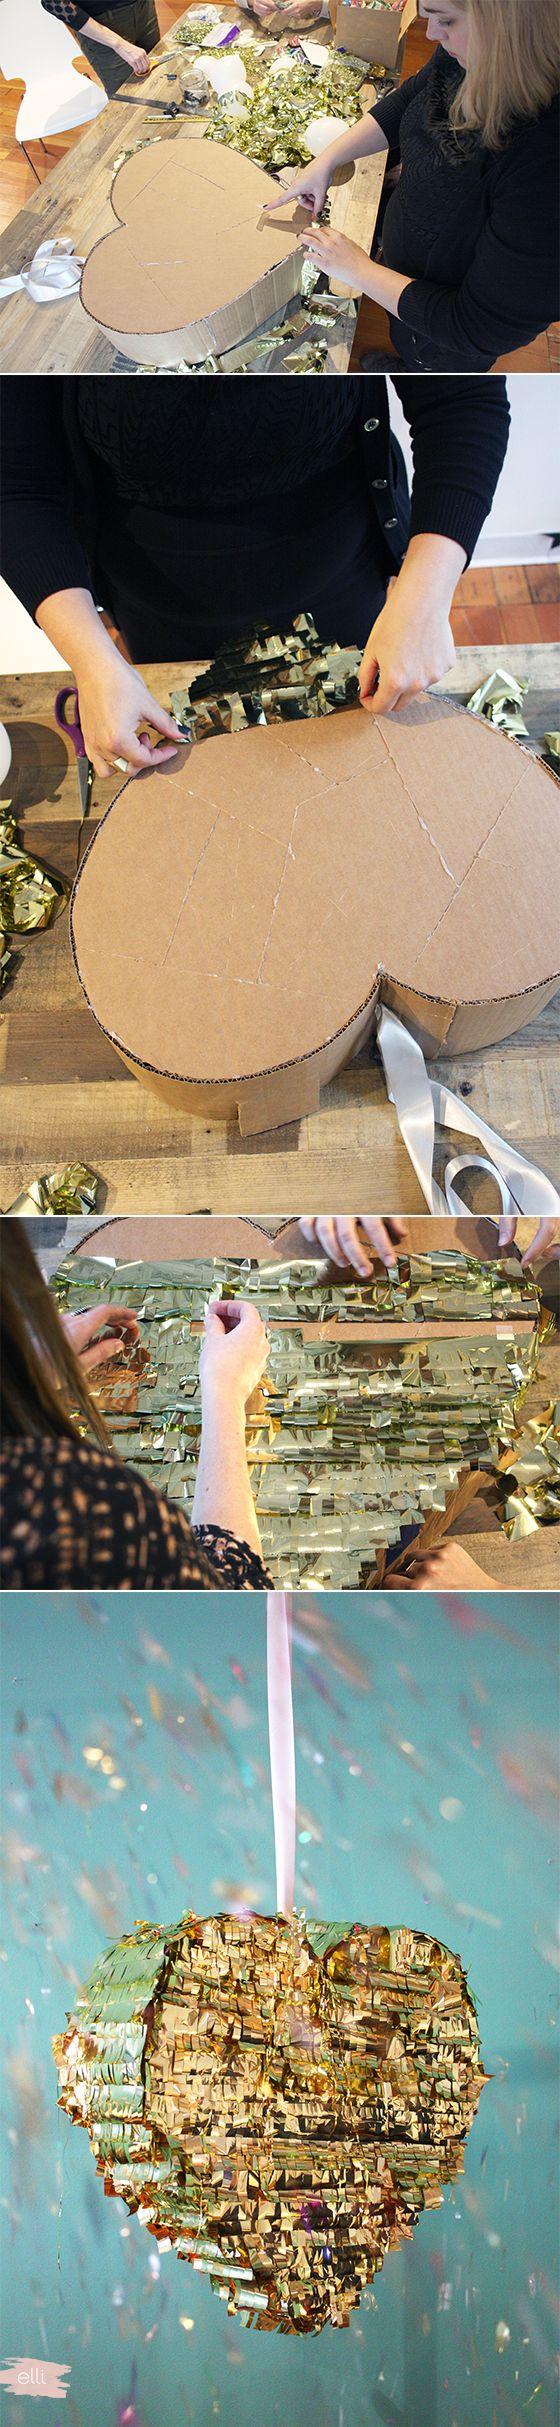 DIY Engagement Party Decor Gold Fringe Pinata